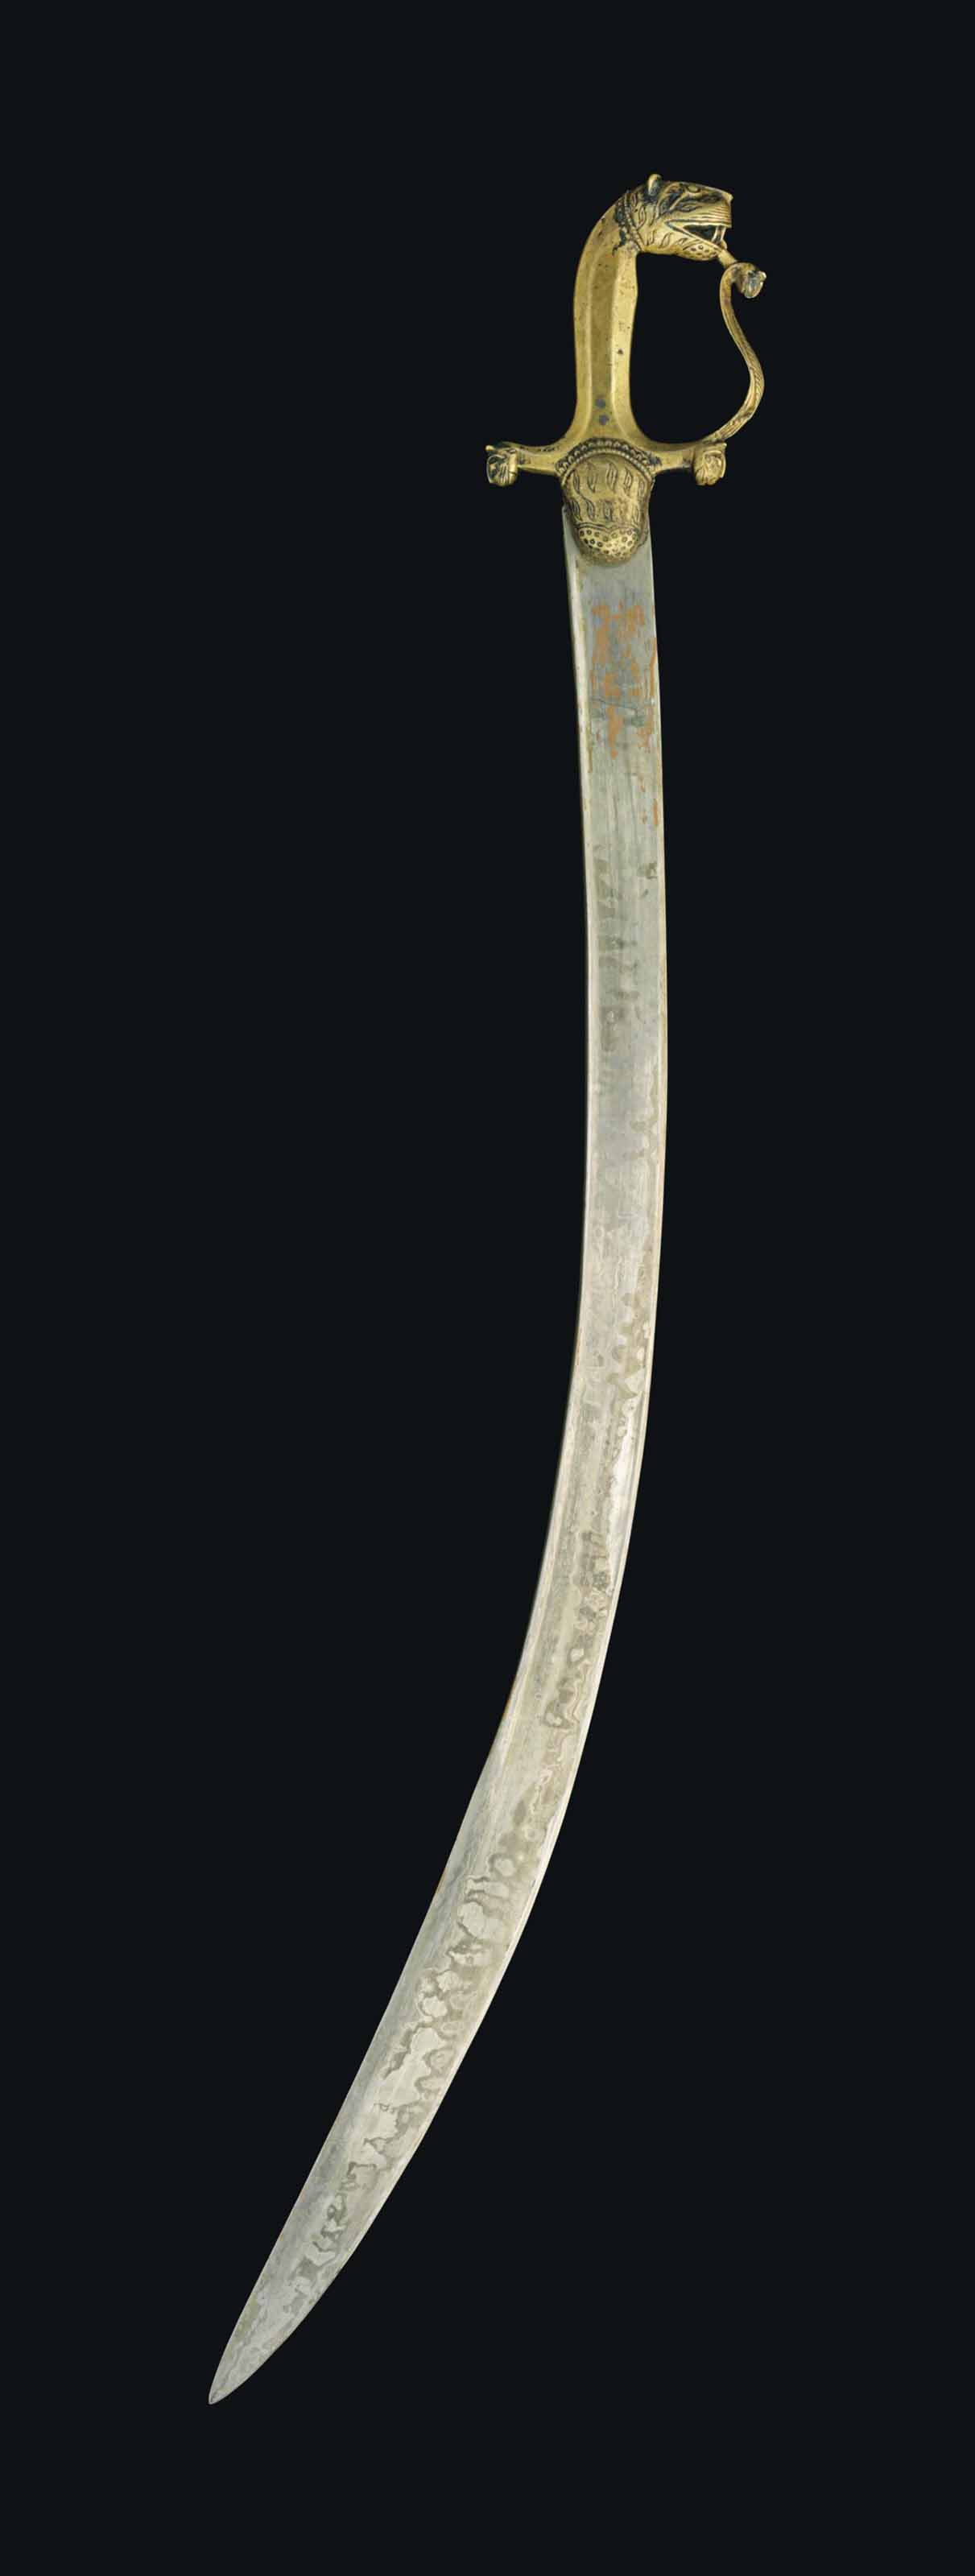 A SWORD WITH A TIGER-HEAD HILT